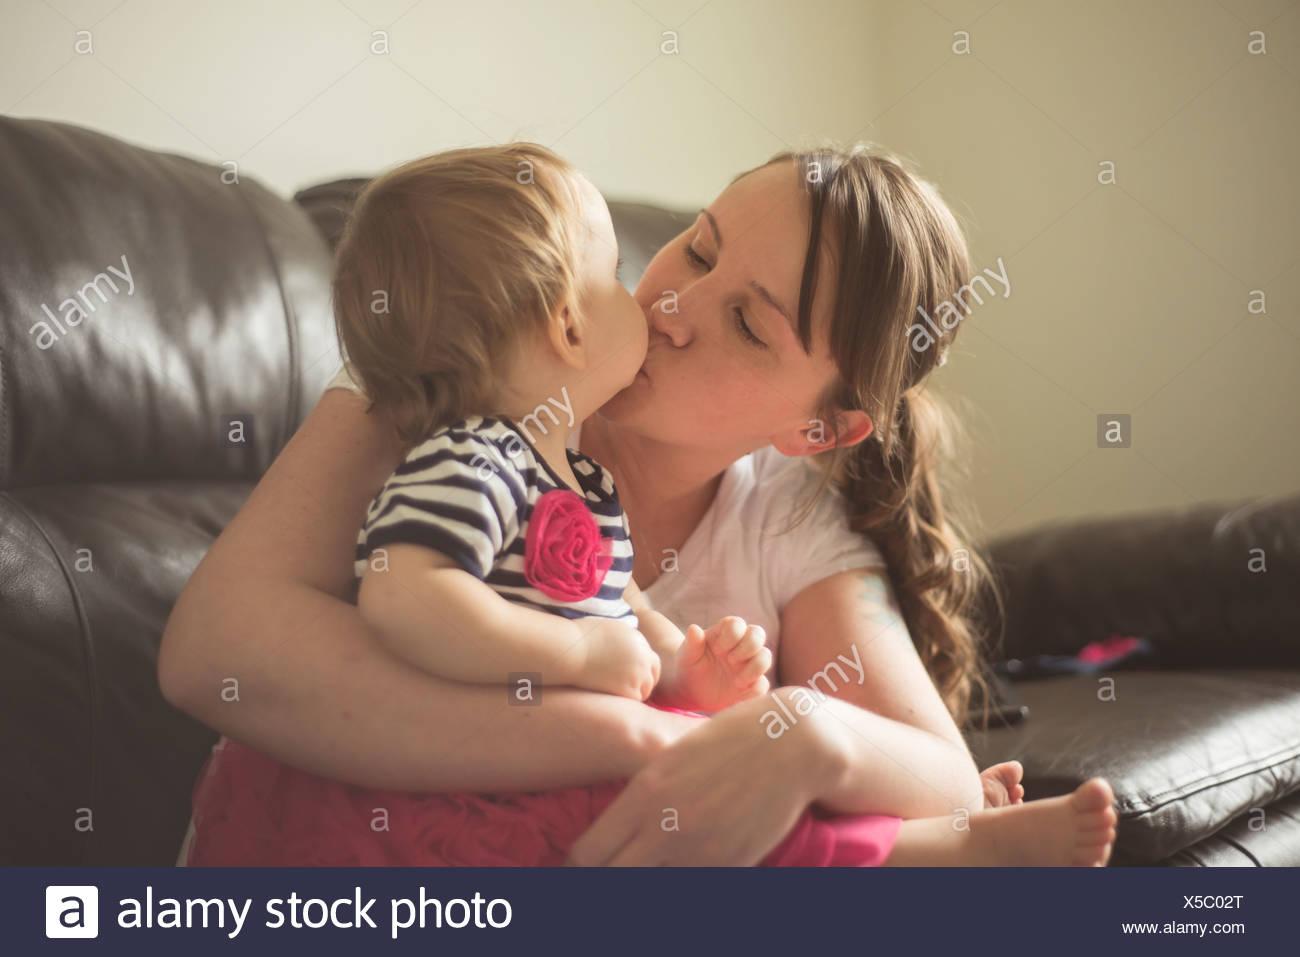 Female toddler sitting on mothers lap on sofa - Stock Image